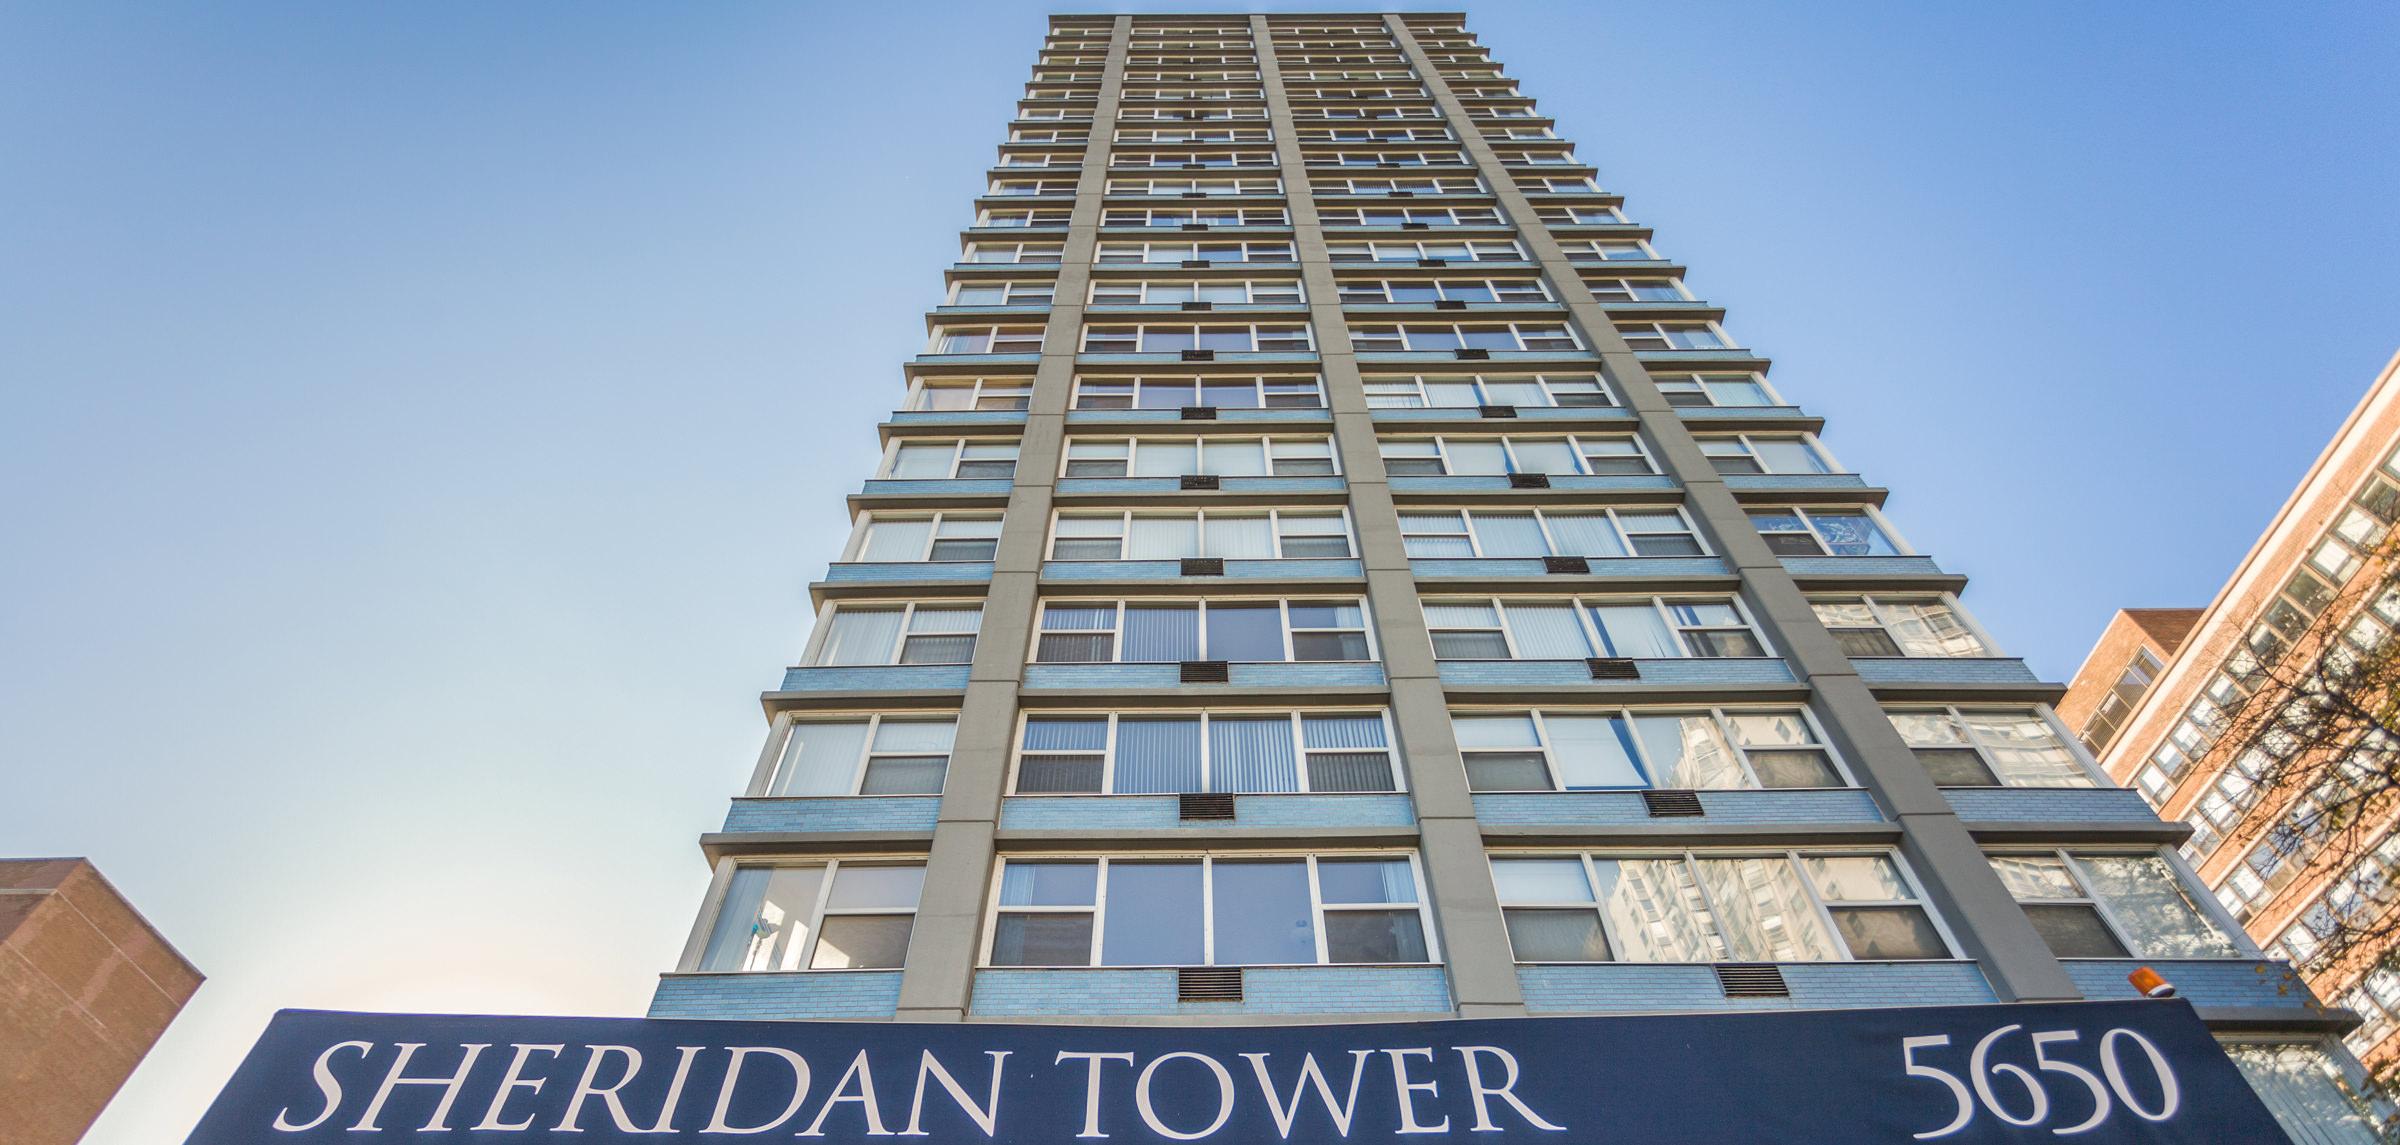 Sheridan Tower